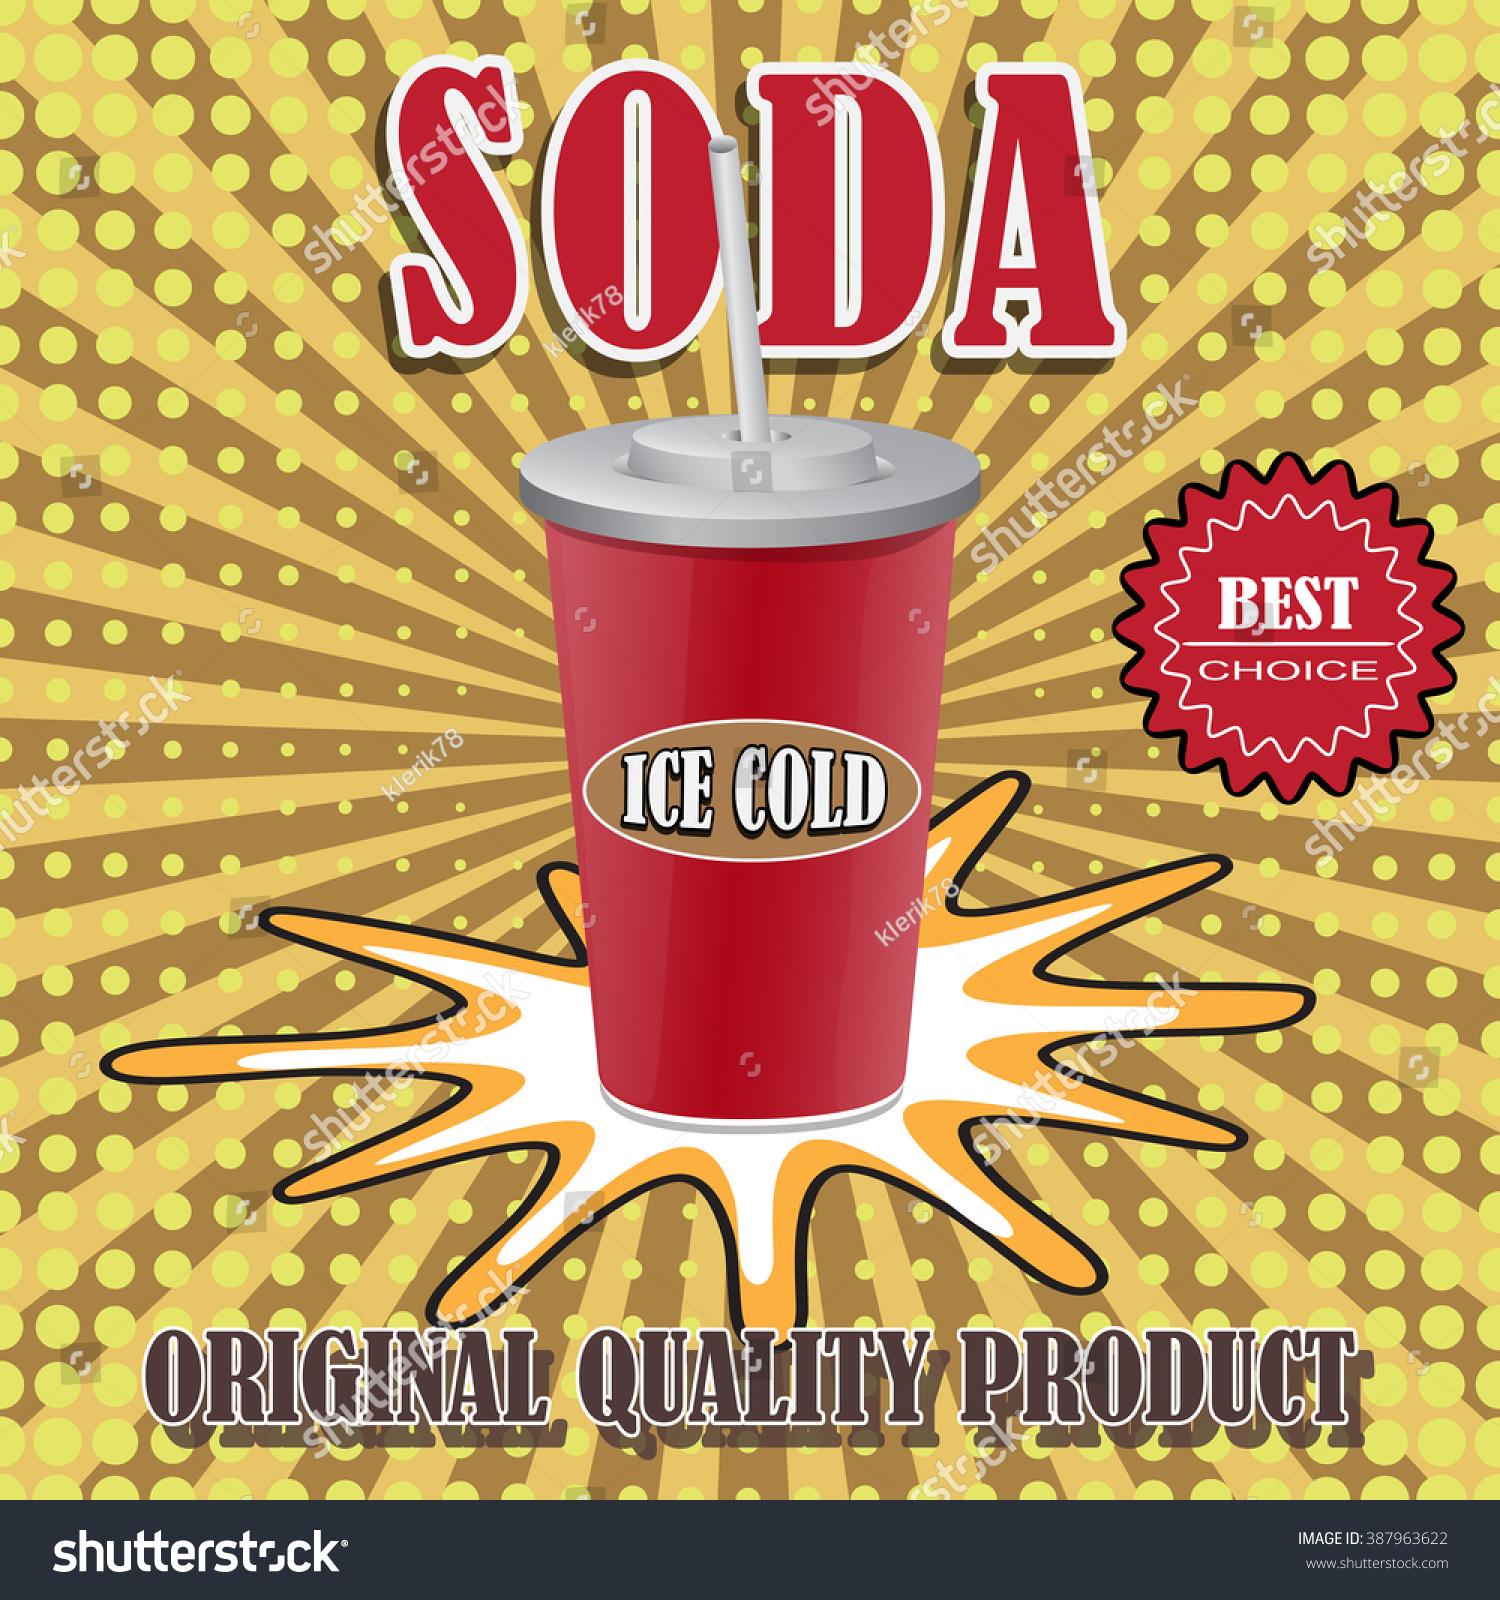 Grunge And Vintage Drinks And Beverage Poster/ Illustration Of A ...